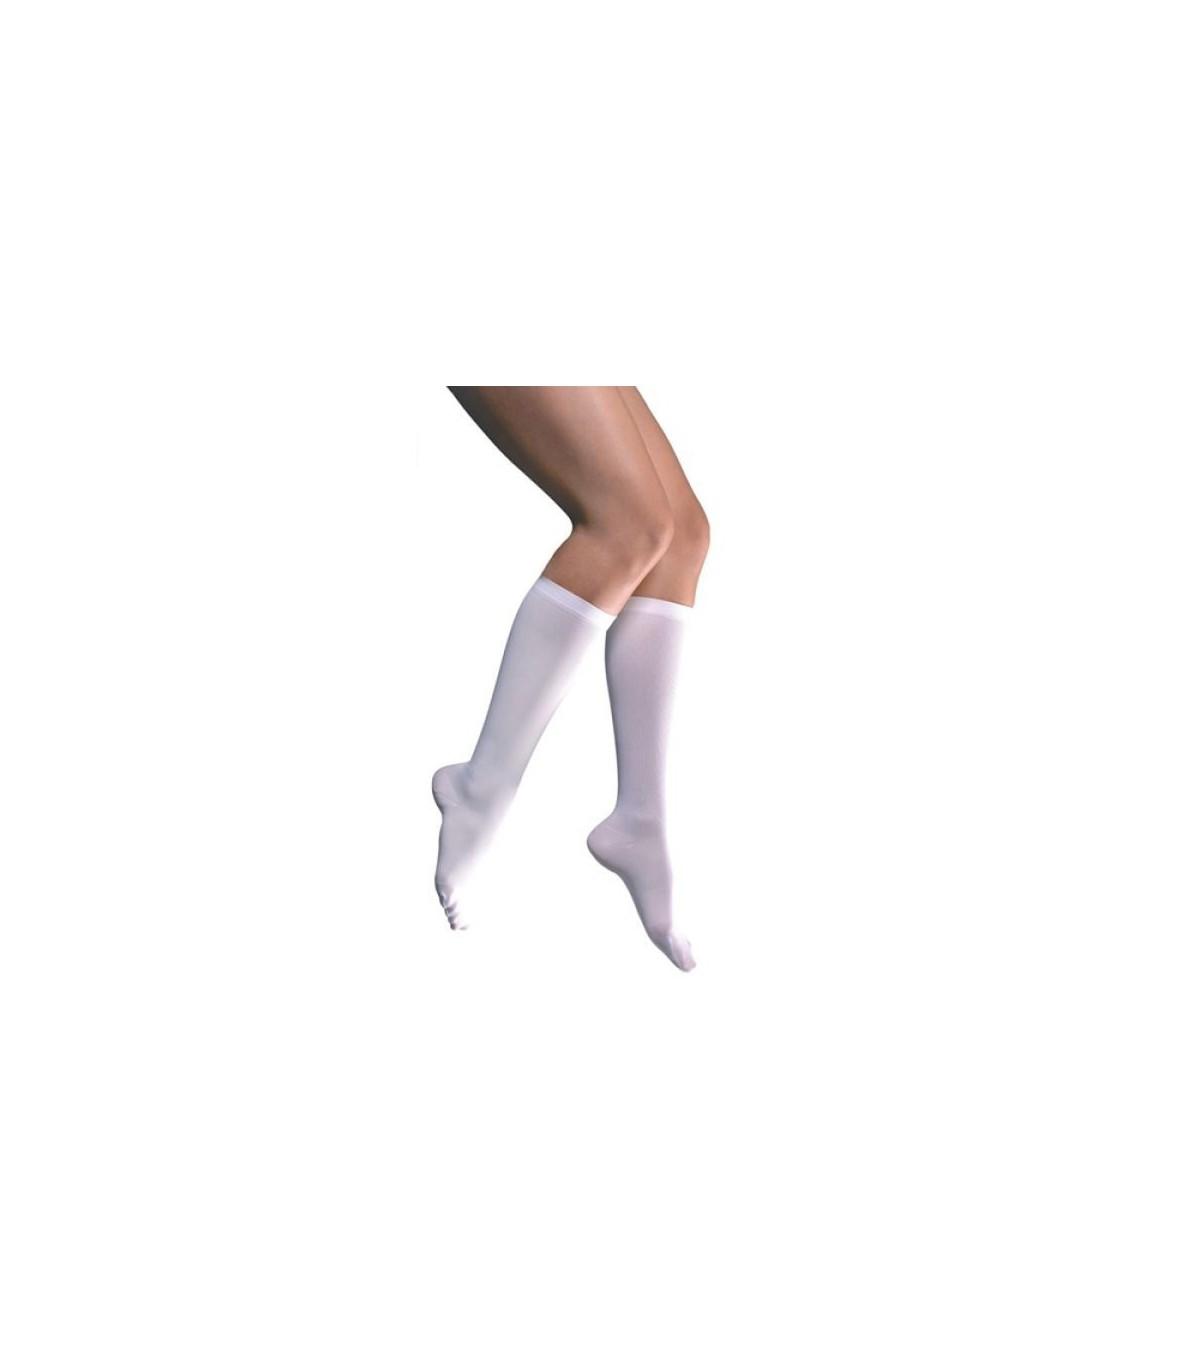 Ciorapi antiembolice clasa 2 (spitale)